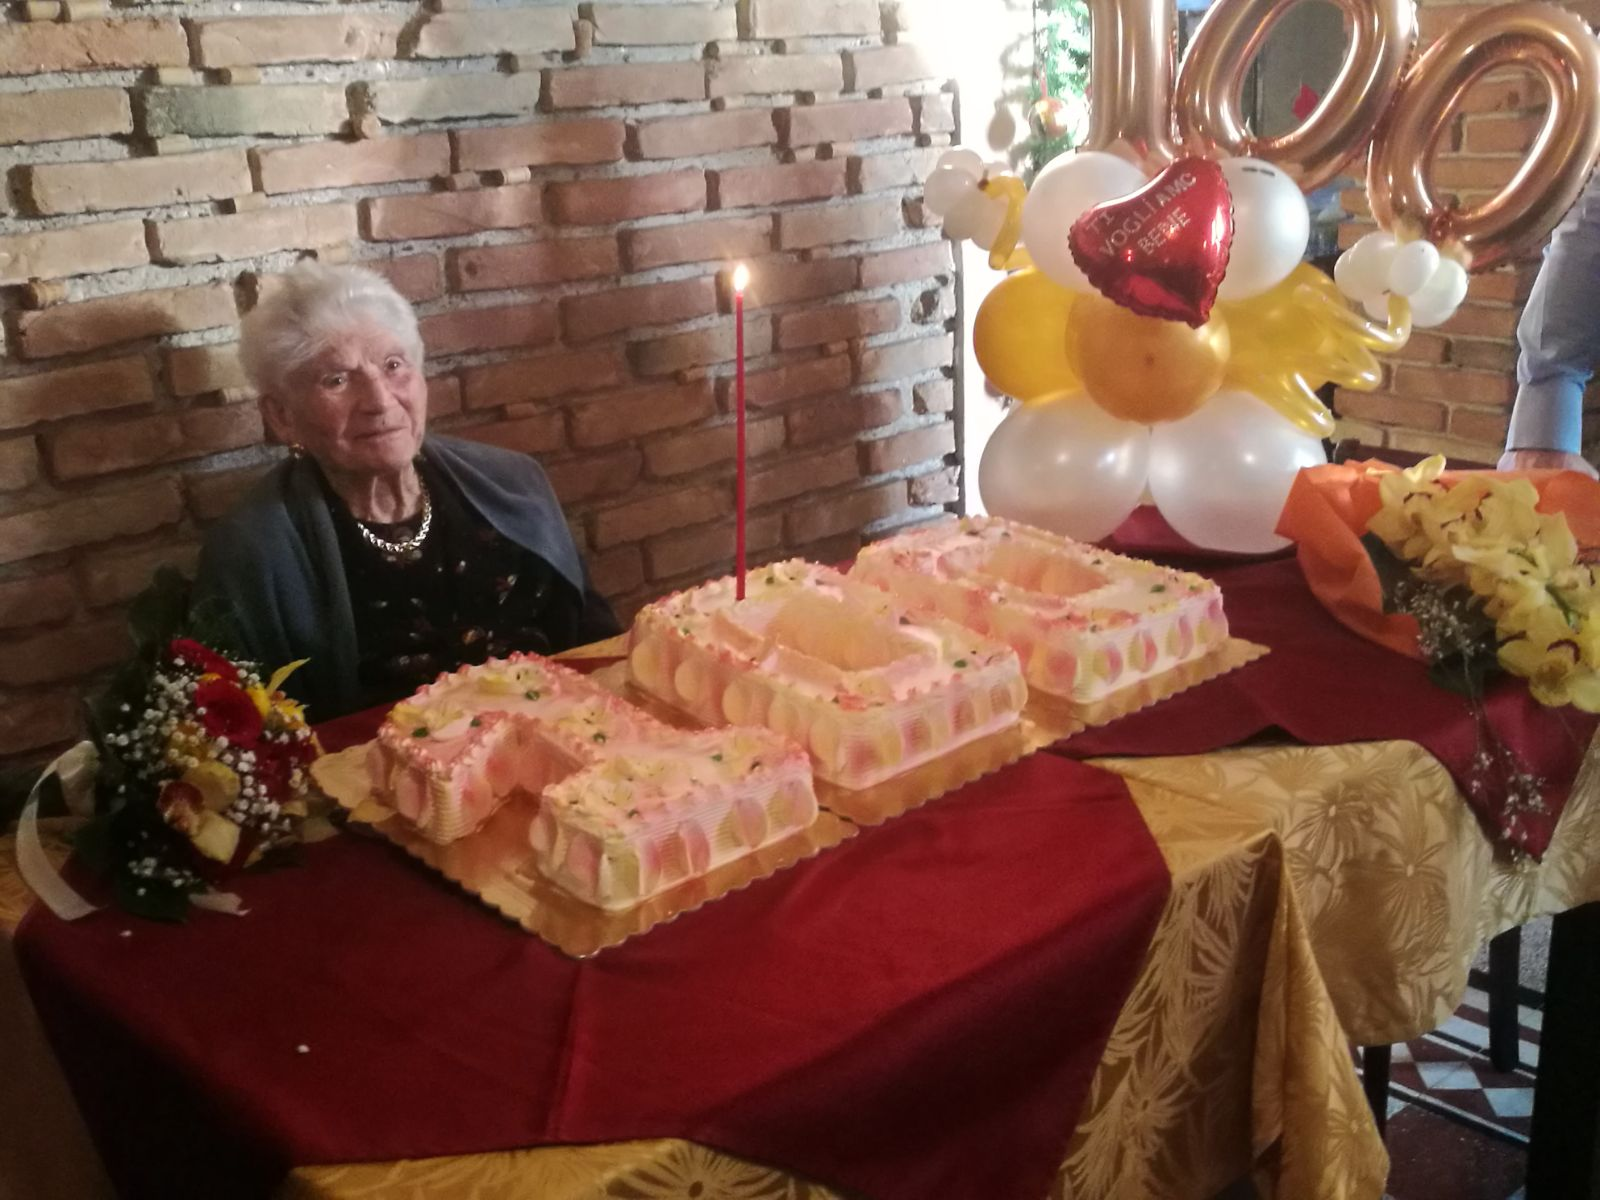 Reggio Calabria centenaria